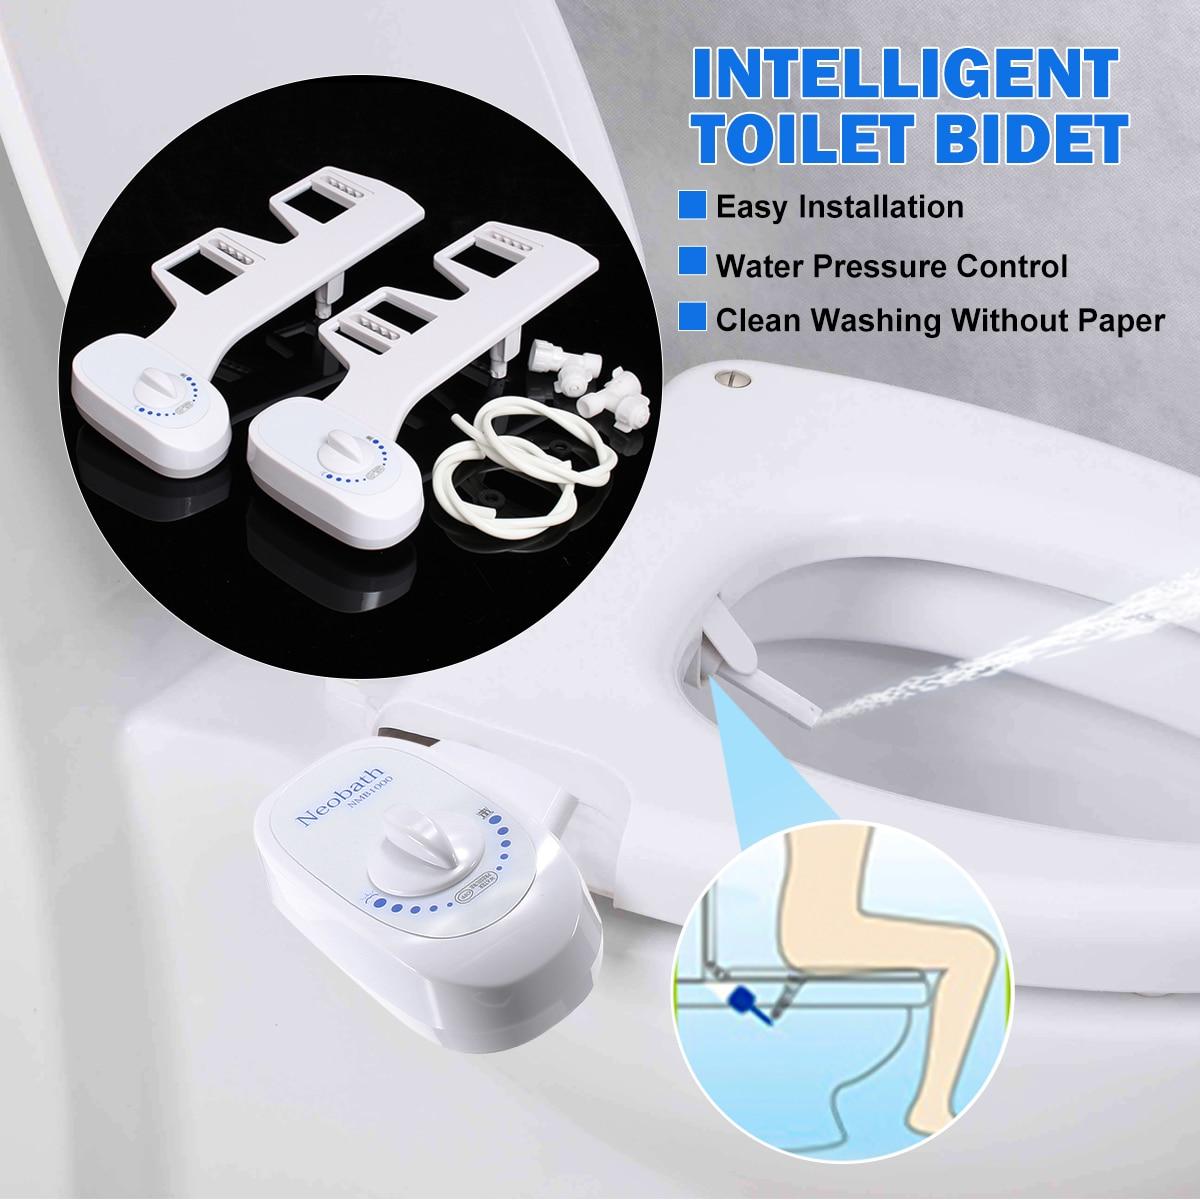 Image 2 - Xueqin Single Nozzle Bathroom Toilet Seat Bidet Sprayer Cold Water Non Electric Toilet Sprayer Nozzle Sprinkle  1/2  15/16Bidets   -